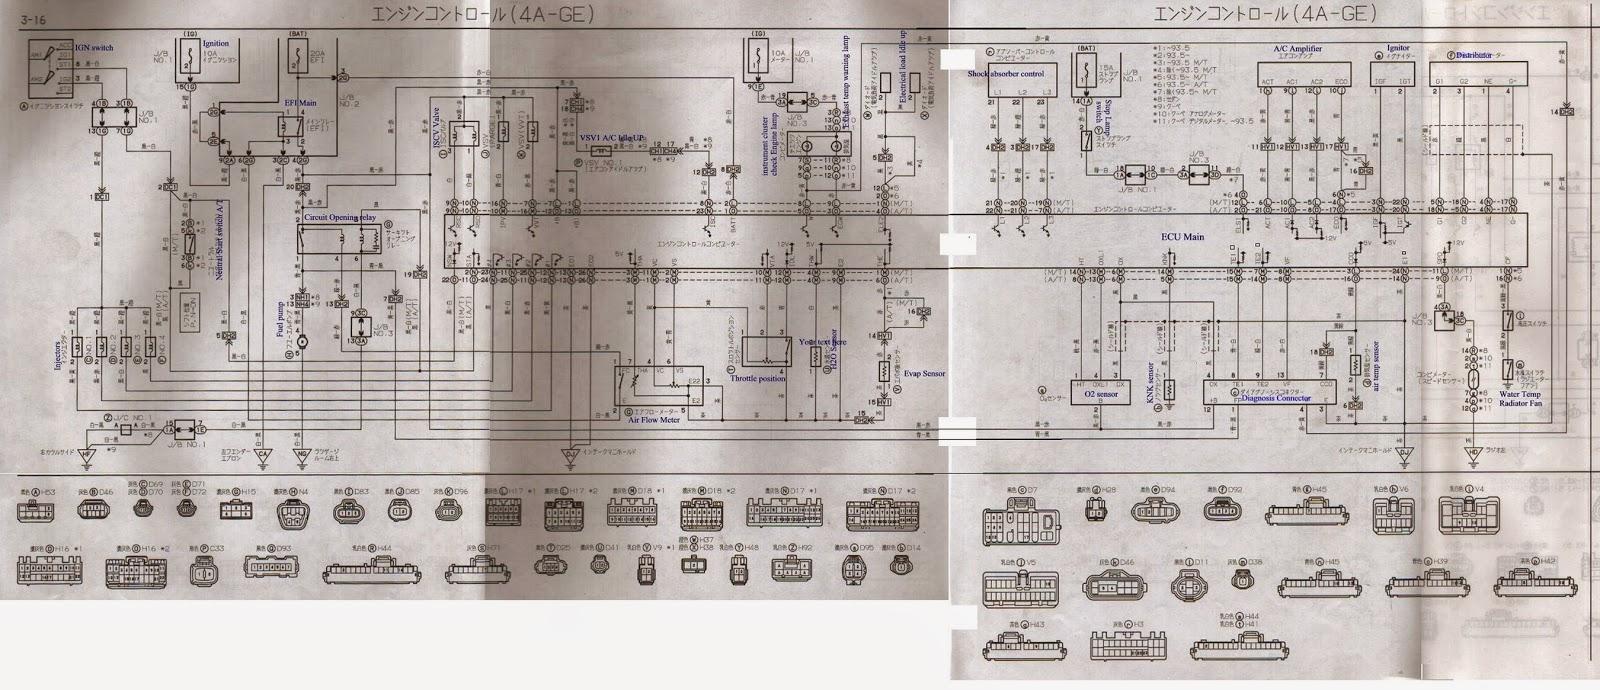 4A-GE 20V AE101 ECU pinout,wiring diagram